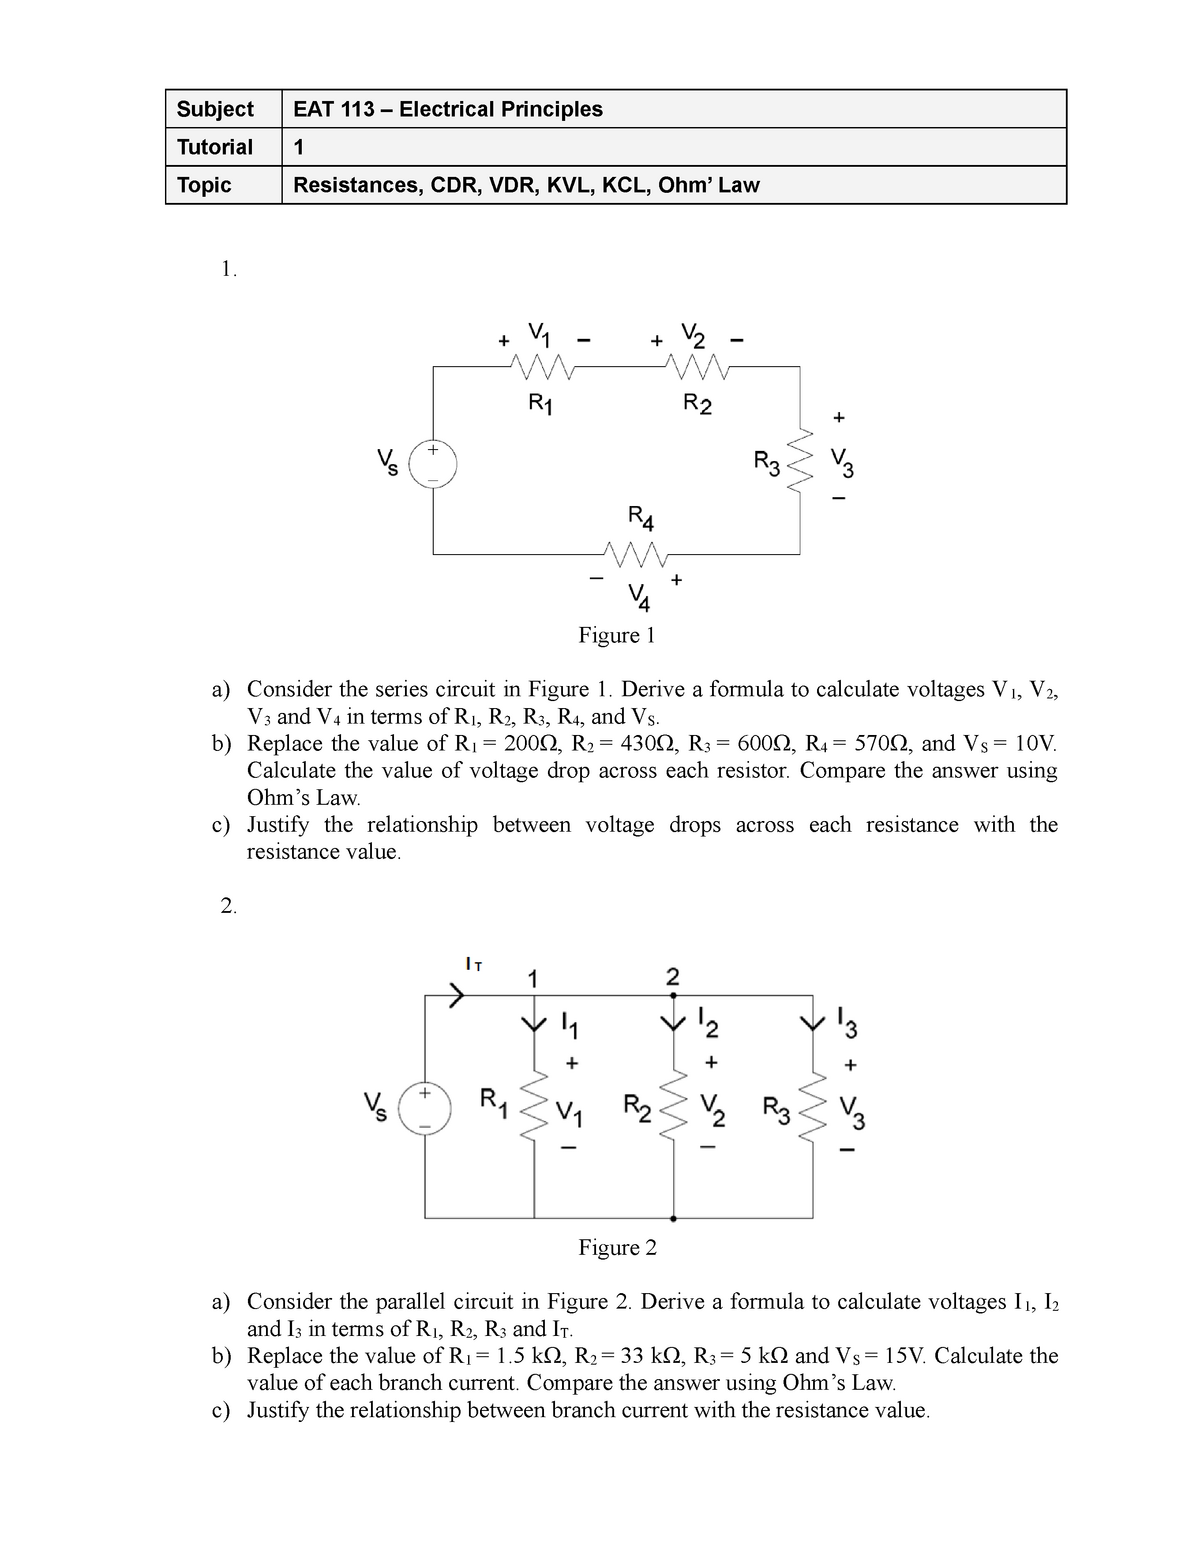 Drop Across Resistor R 1 Voltage Drop Across Resistor R 2 Voltage Drop